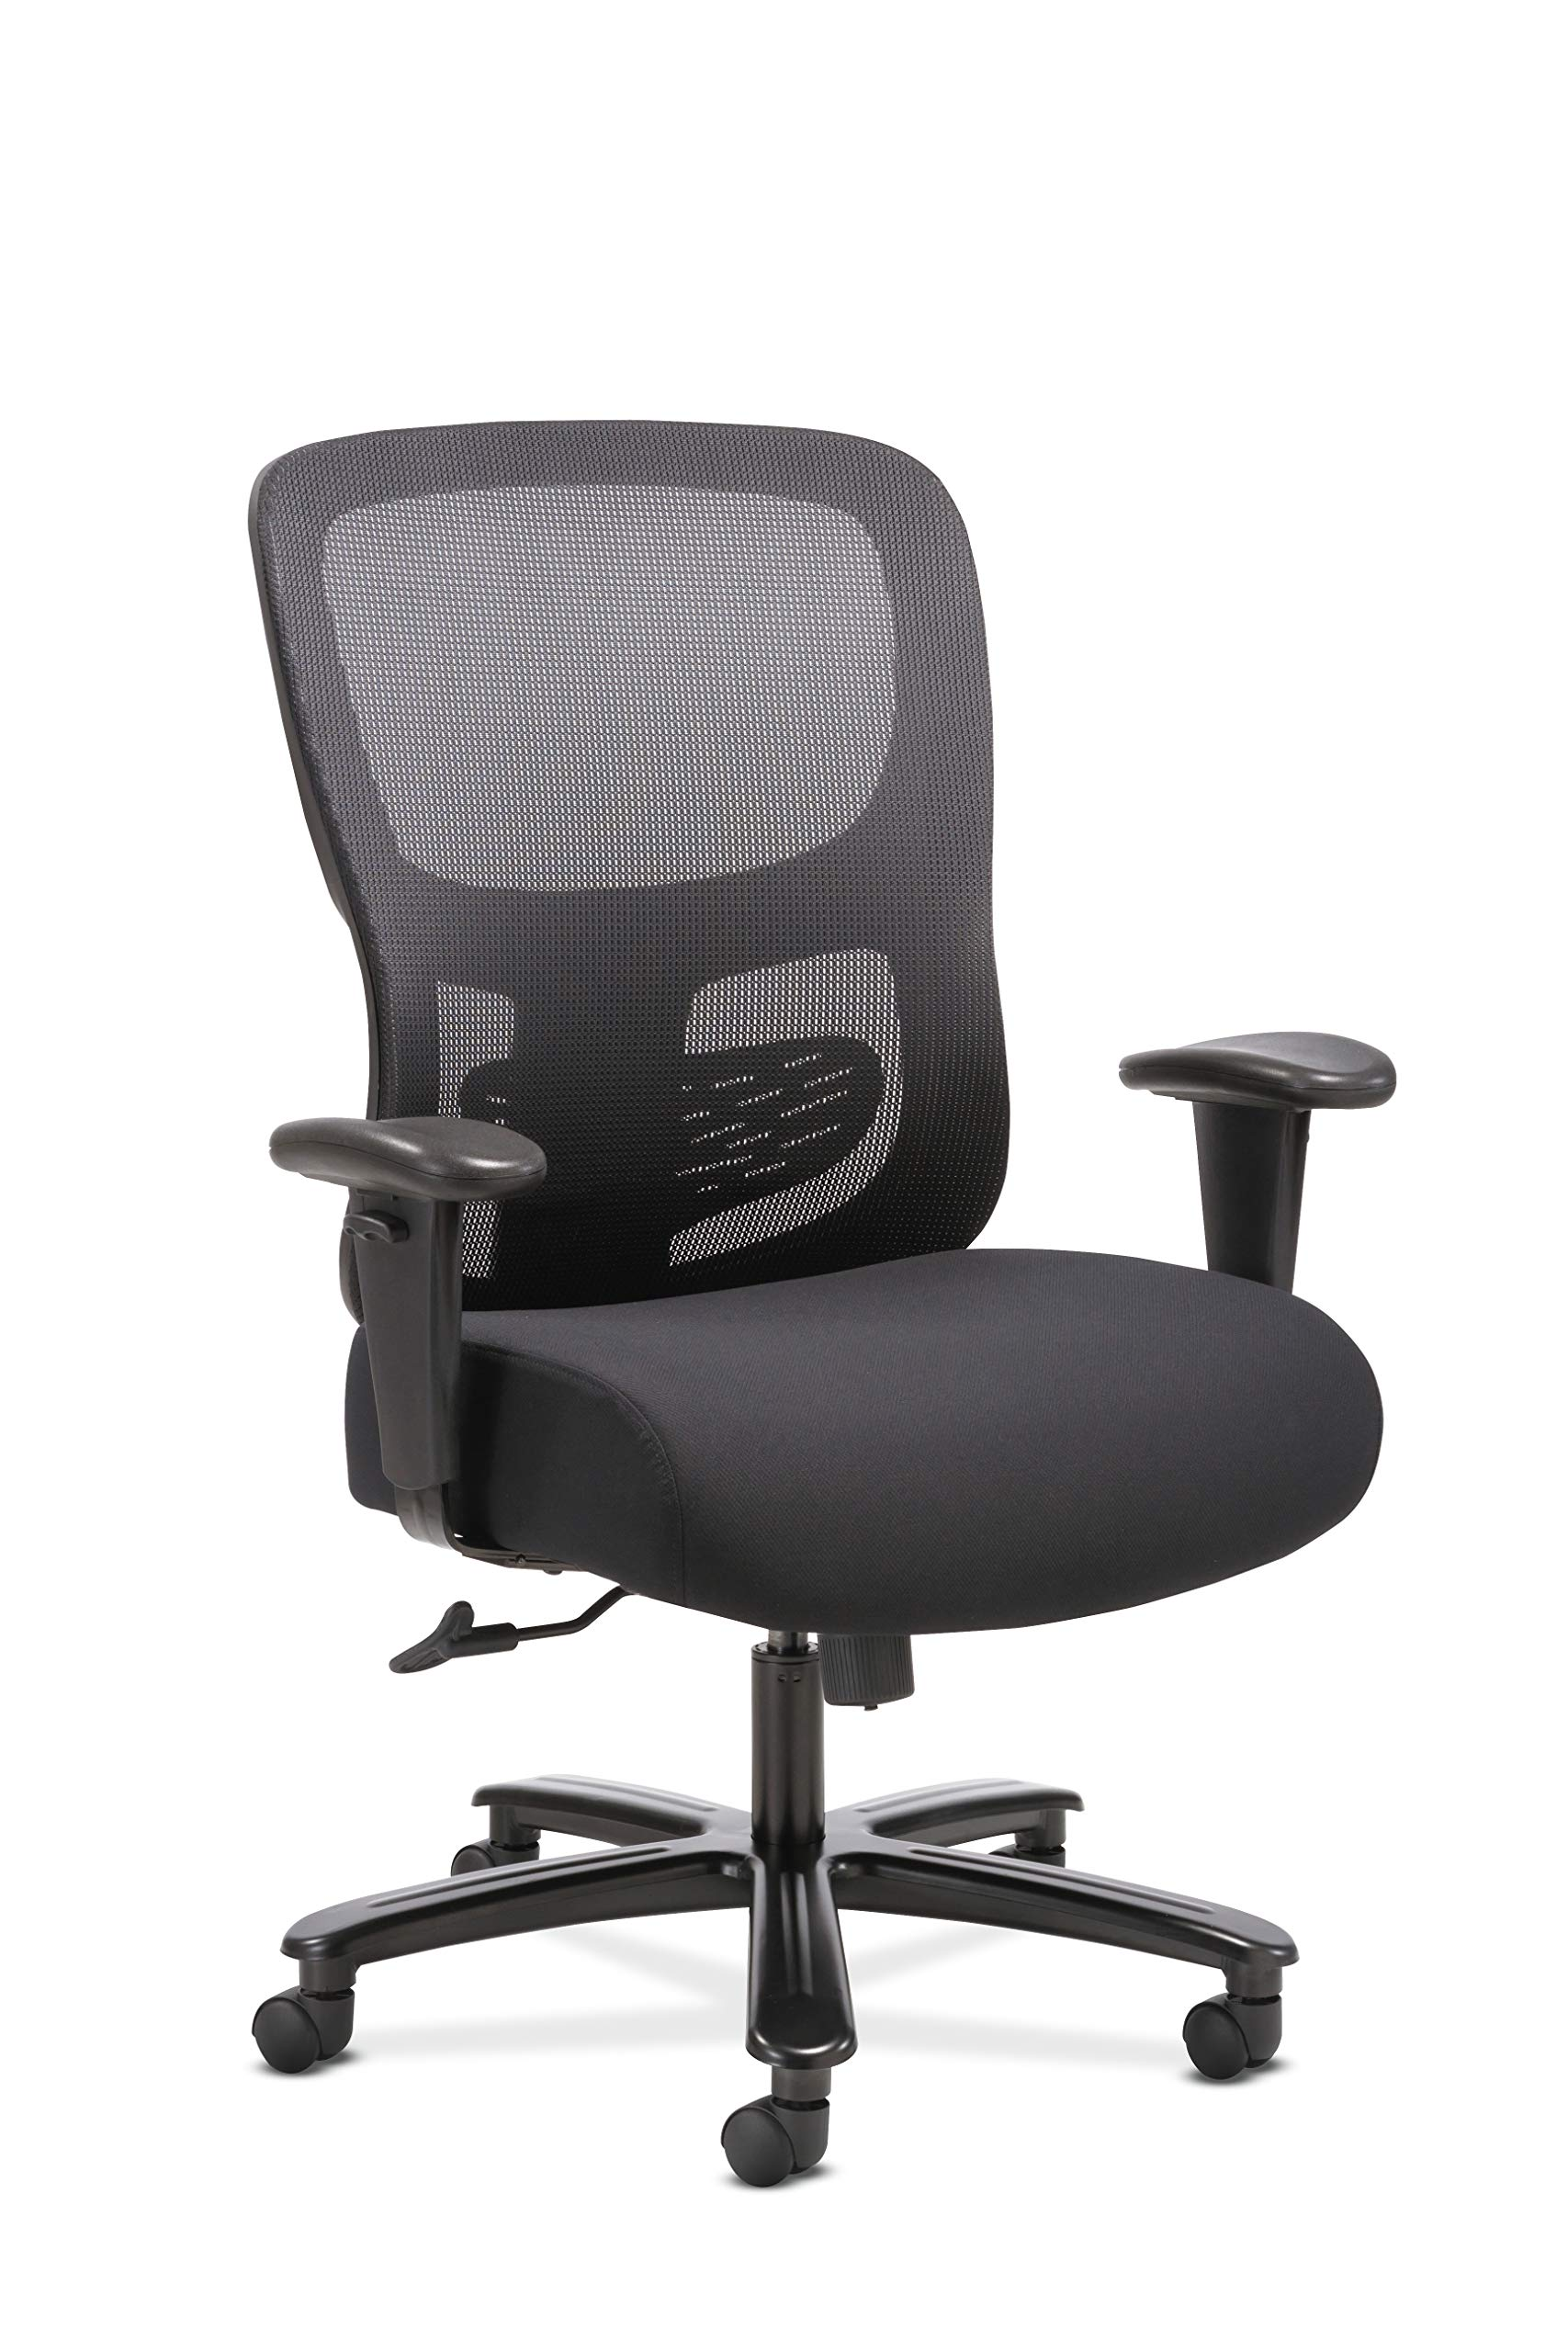 Office Computer Height Adjustable HVST141